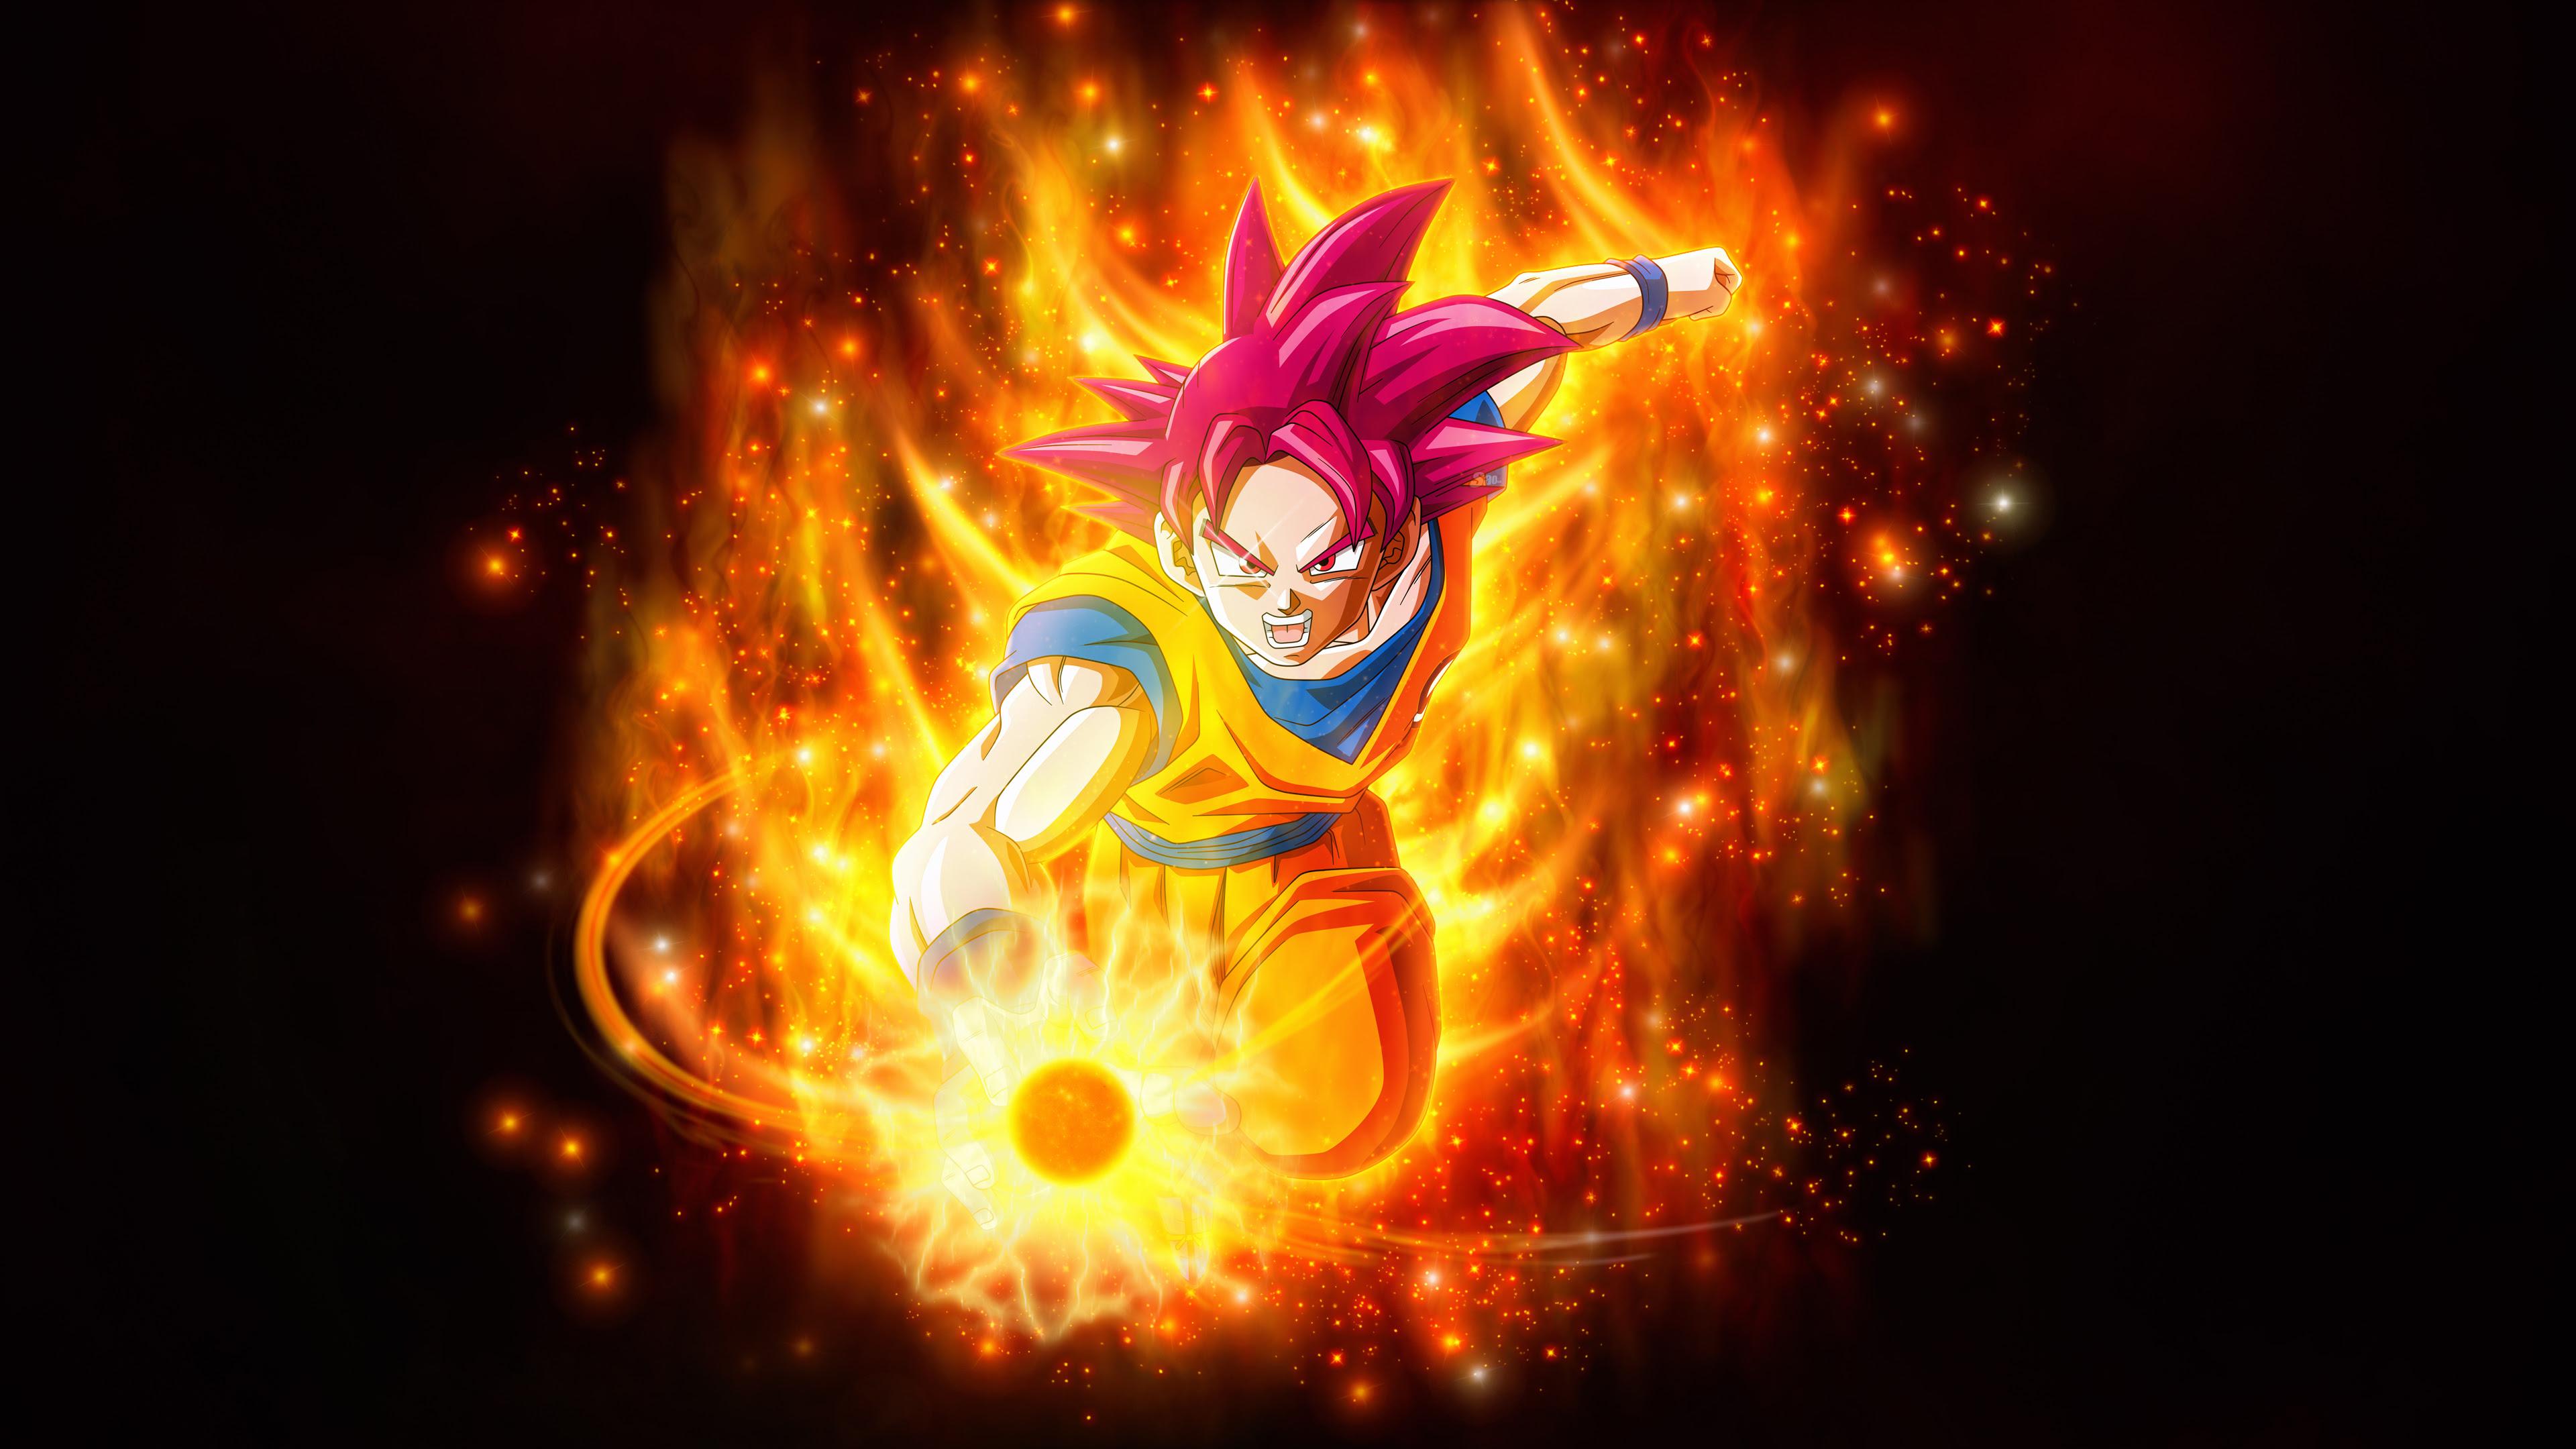 Super Saiyan God Dragon Ball Super Super 4k Wallpapers Wallpapers Hd